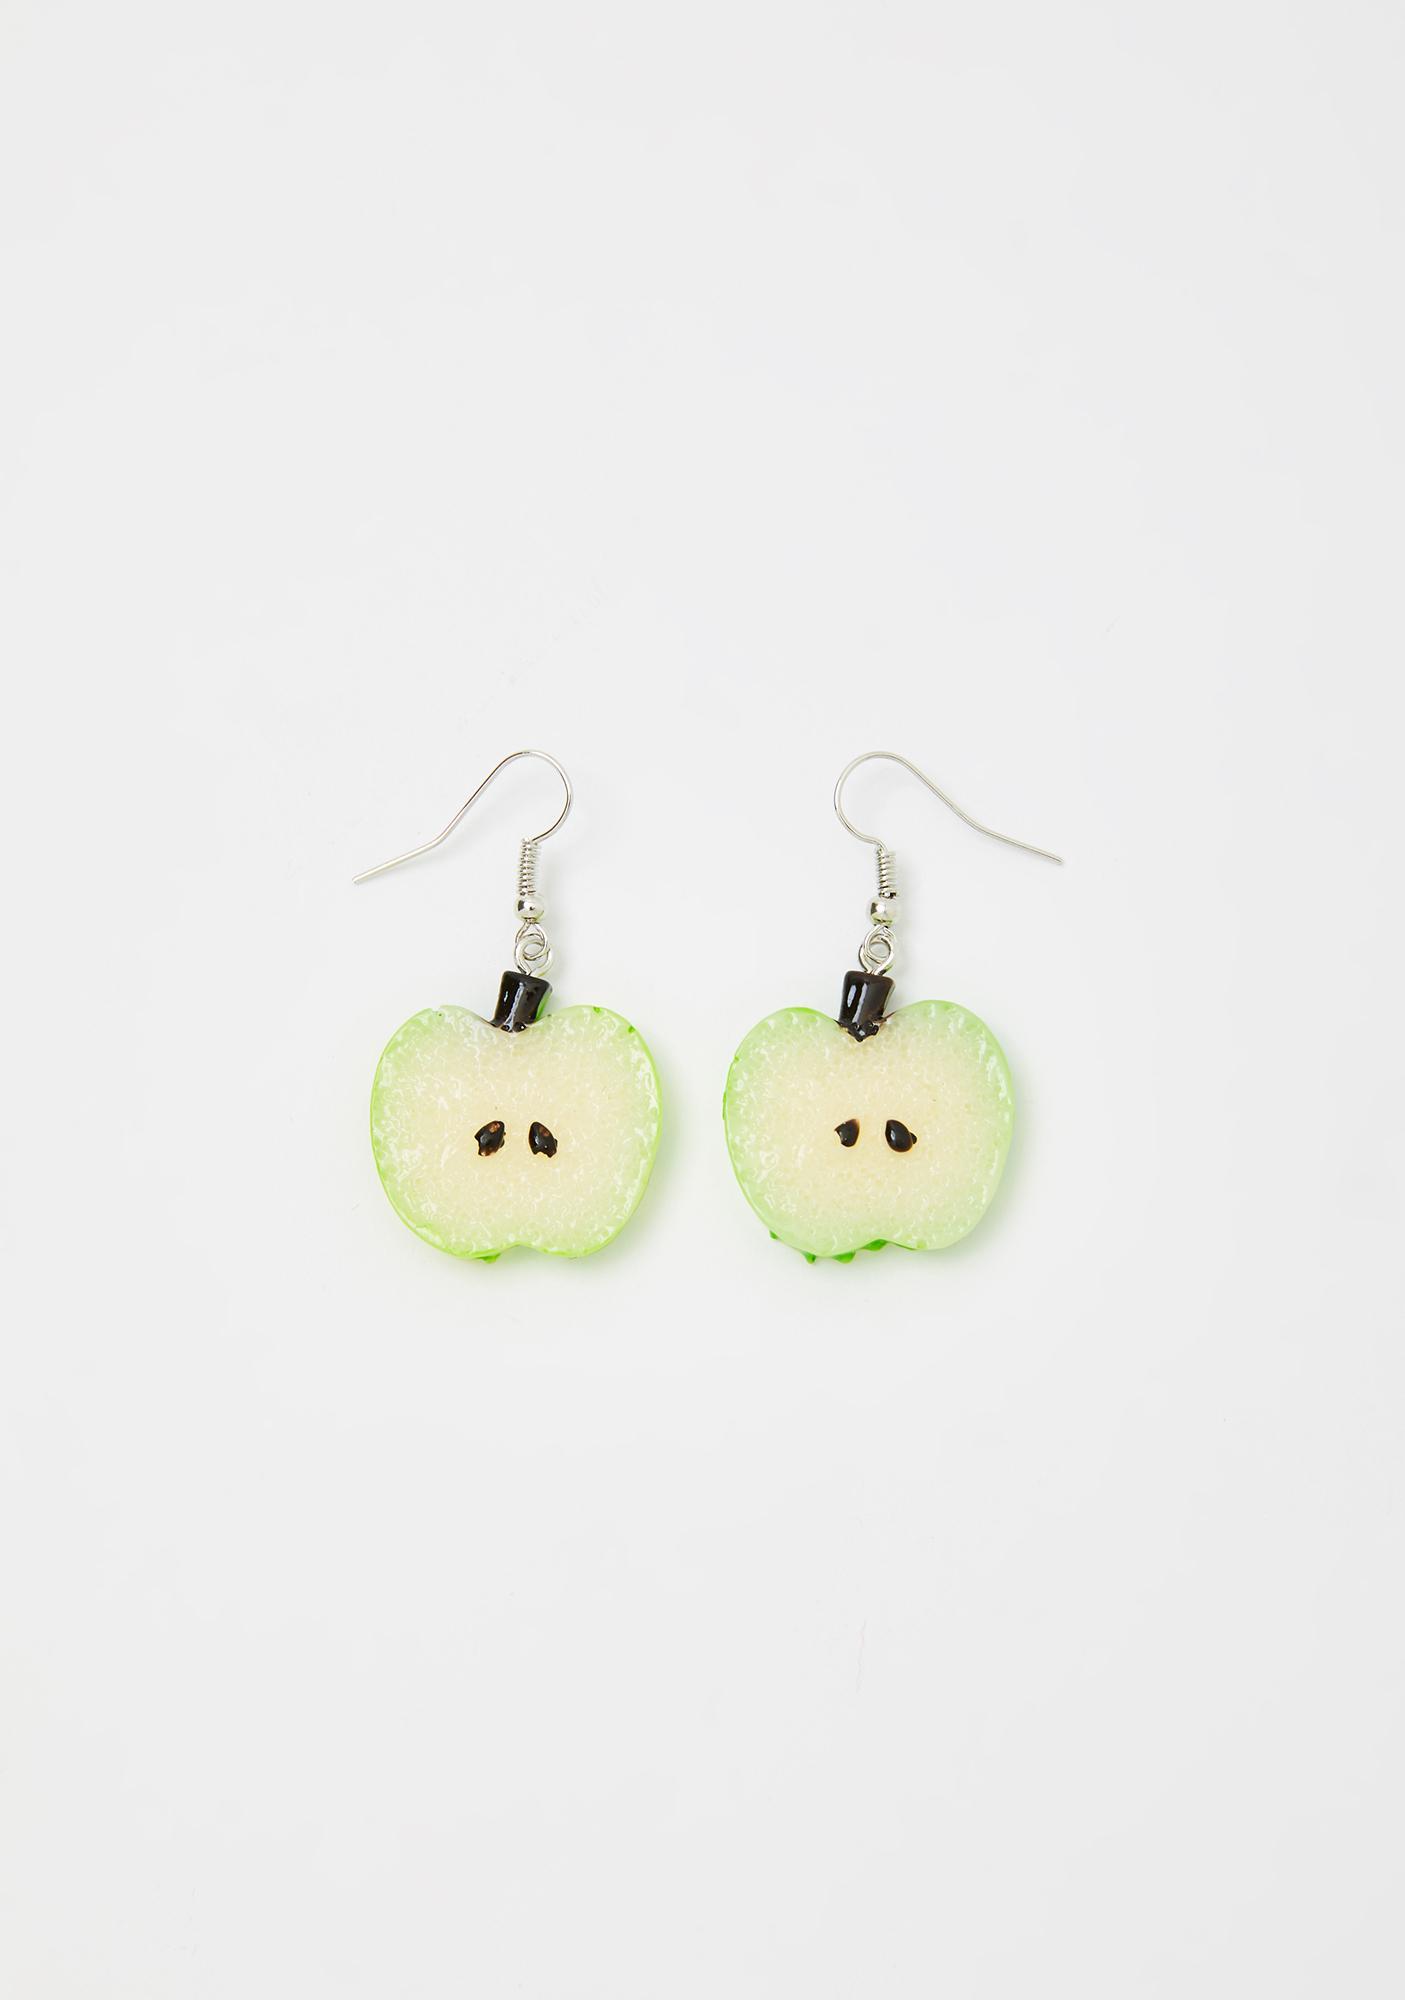 Tart N' Tangy Apple Earrings